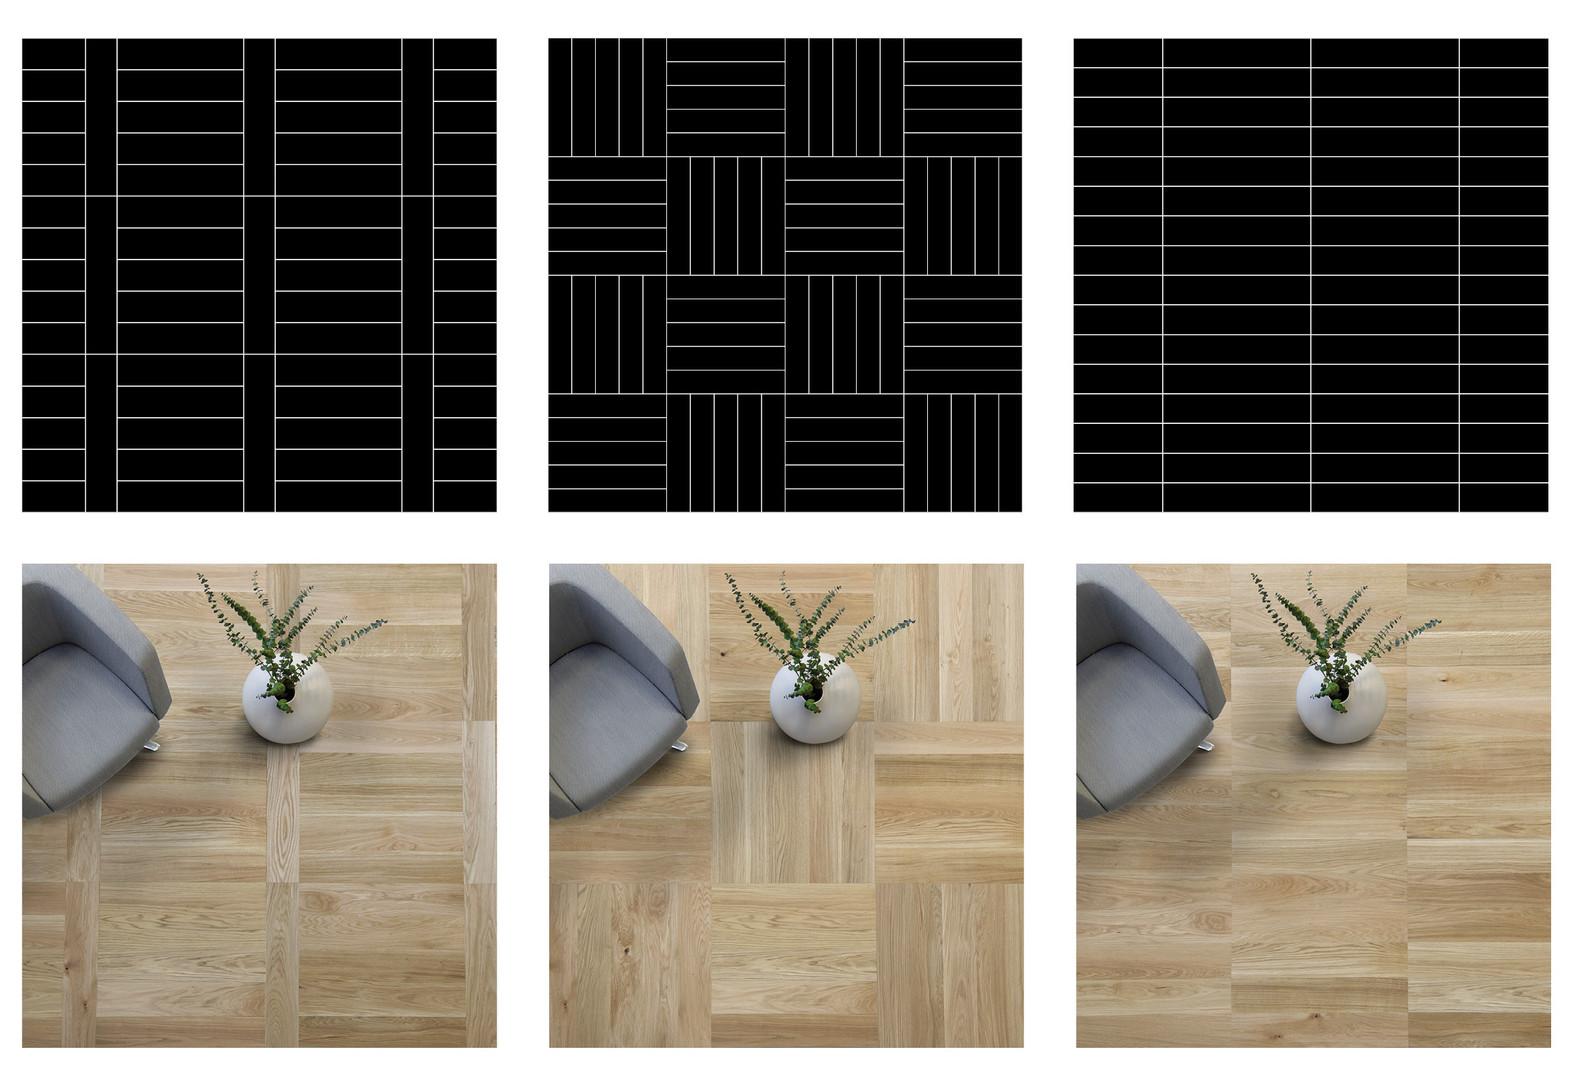 quadrato1.jpg